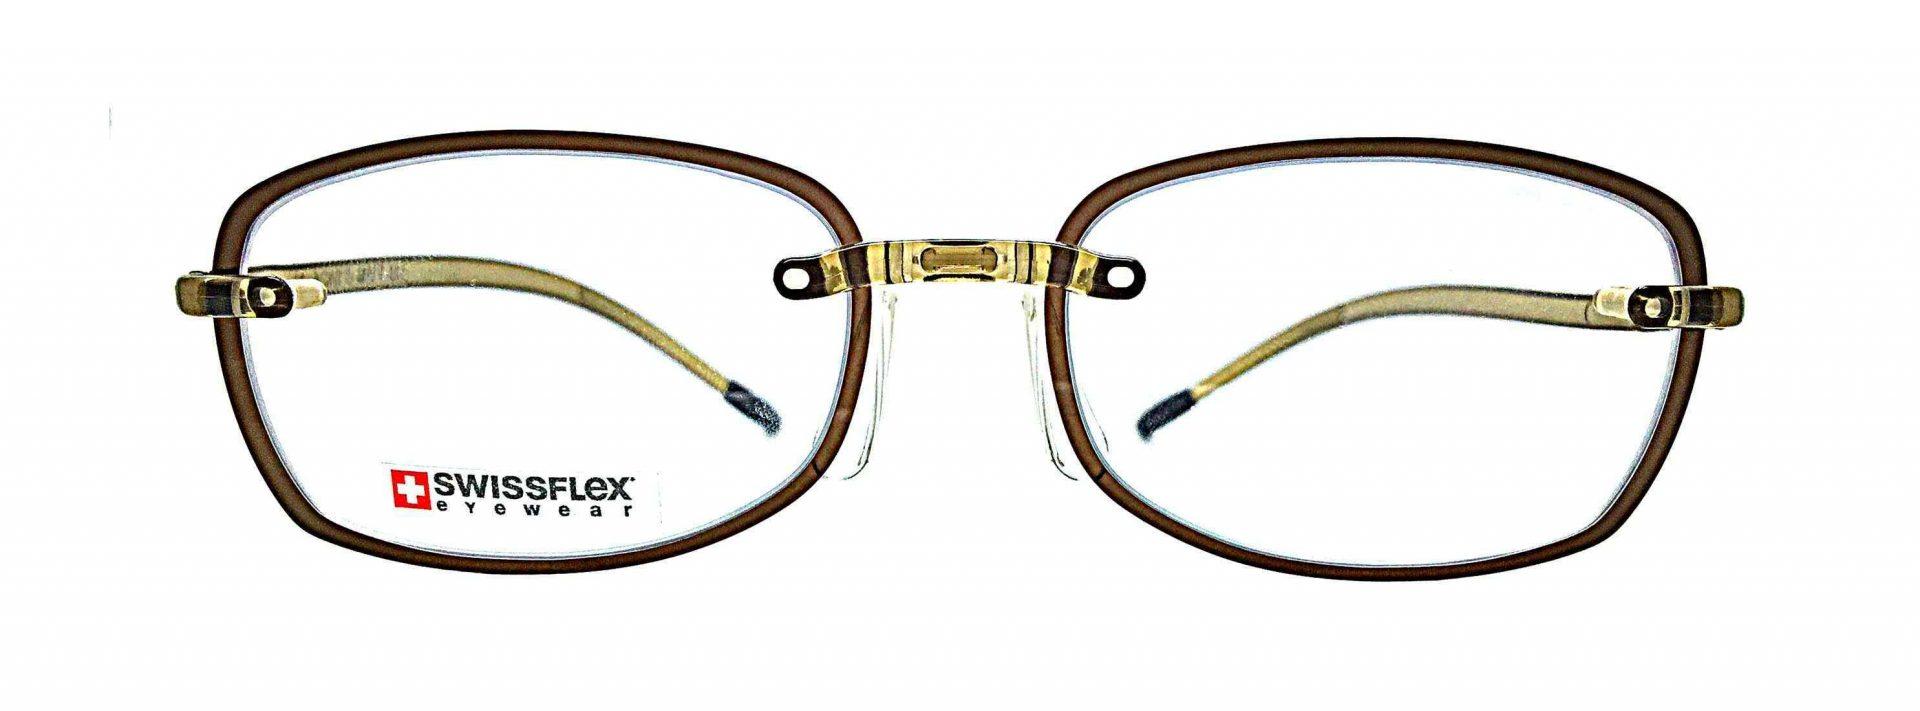 SwissFlex spectacles: SwissFlex Contur 201 52 1 2970x1100